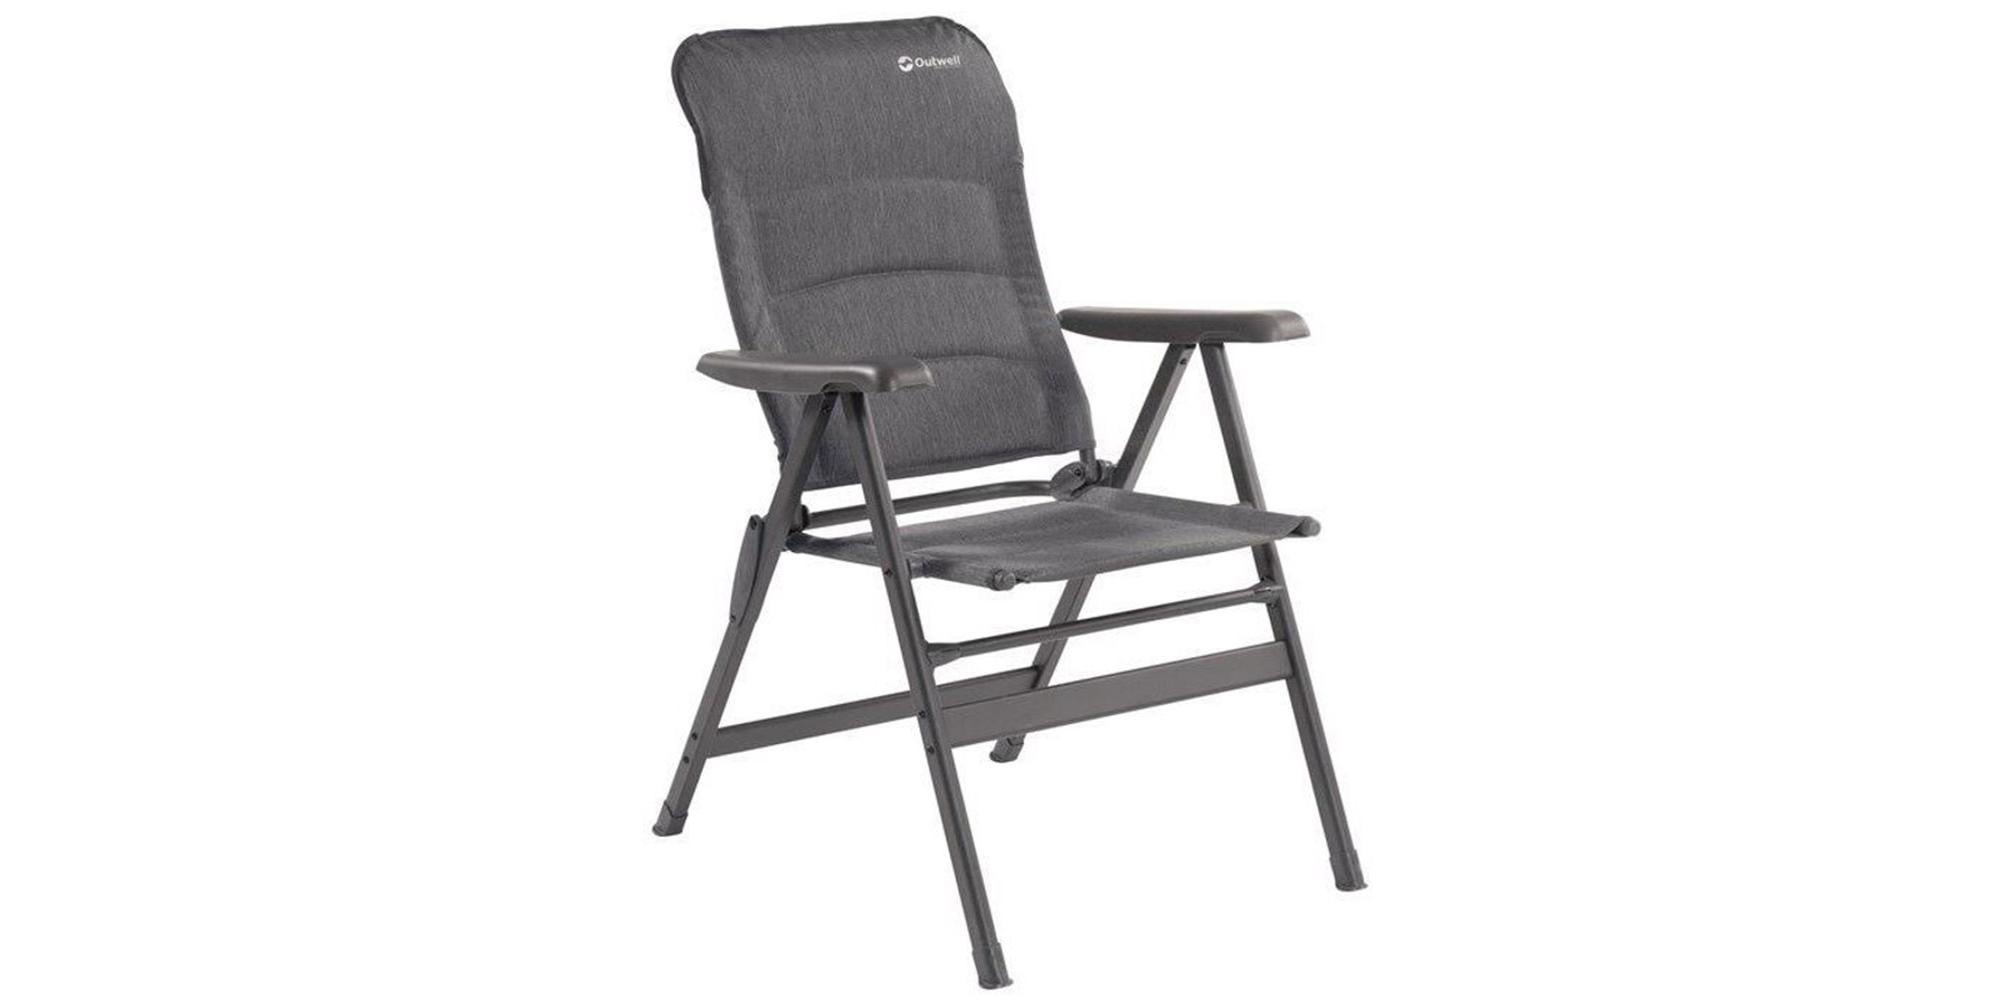 Kempingová židle Outwell Fernley